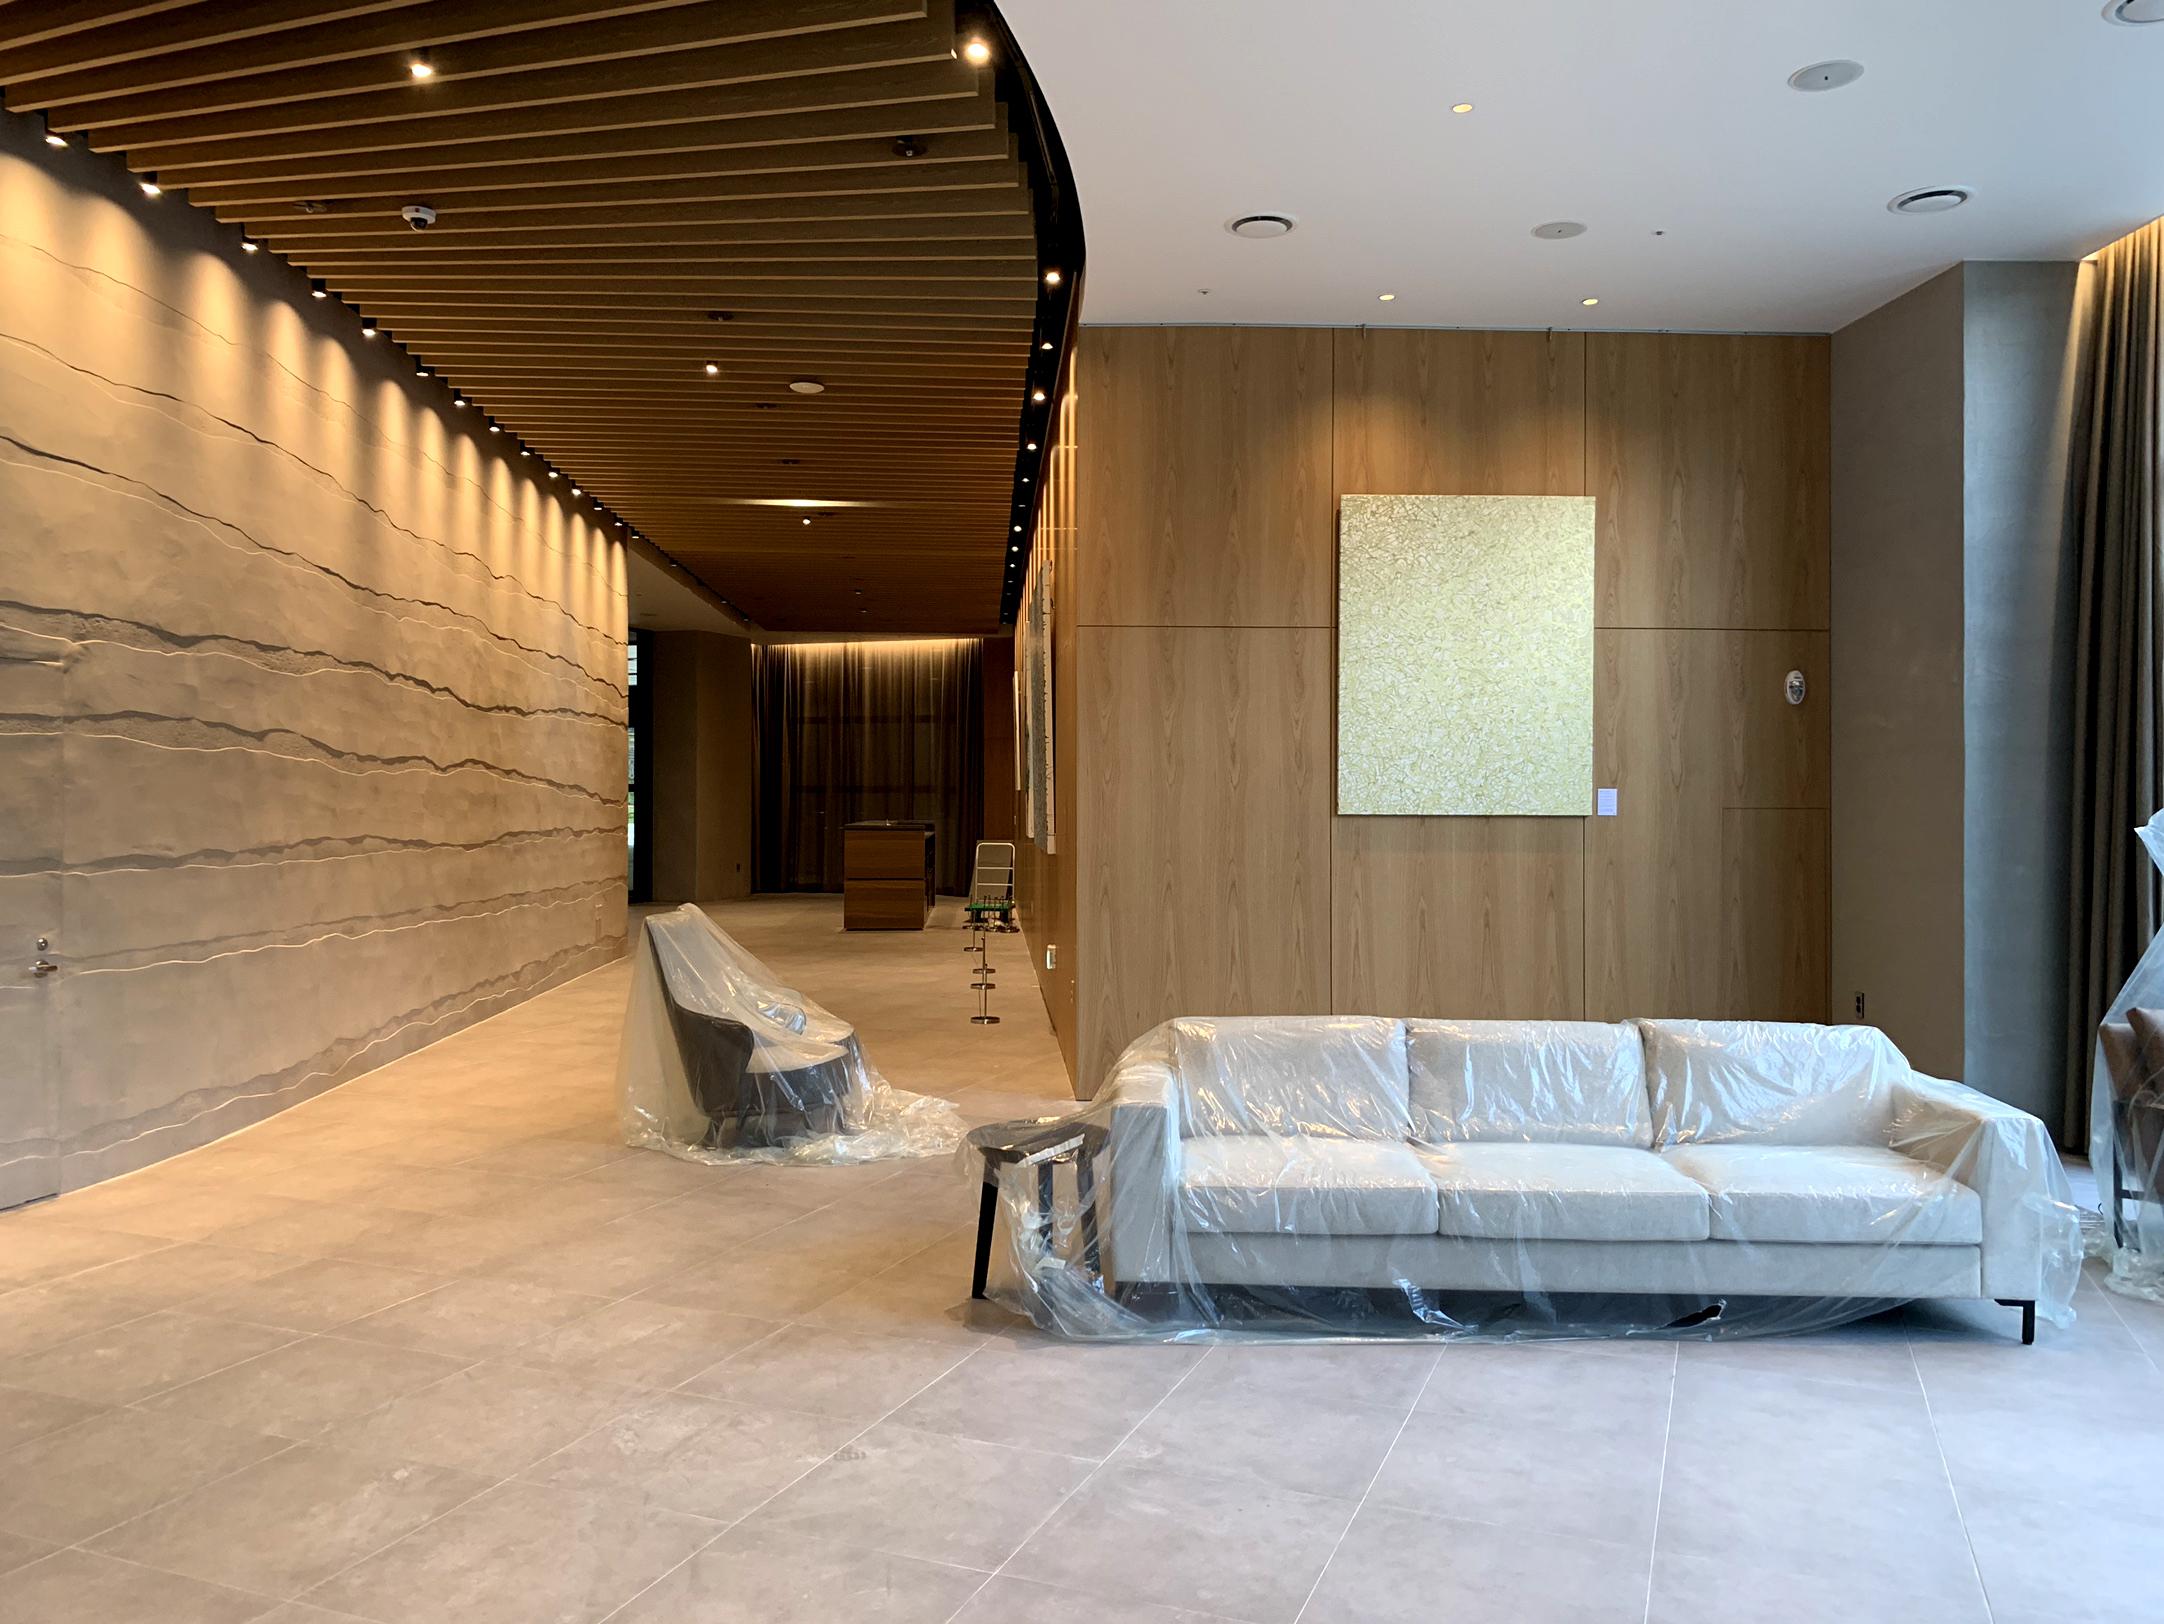 Avani hotel Busan 2019